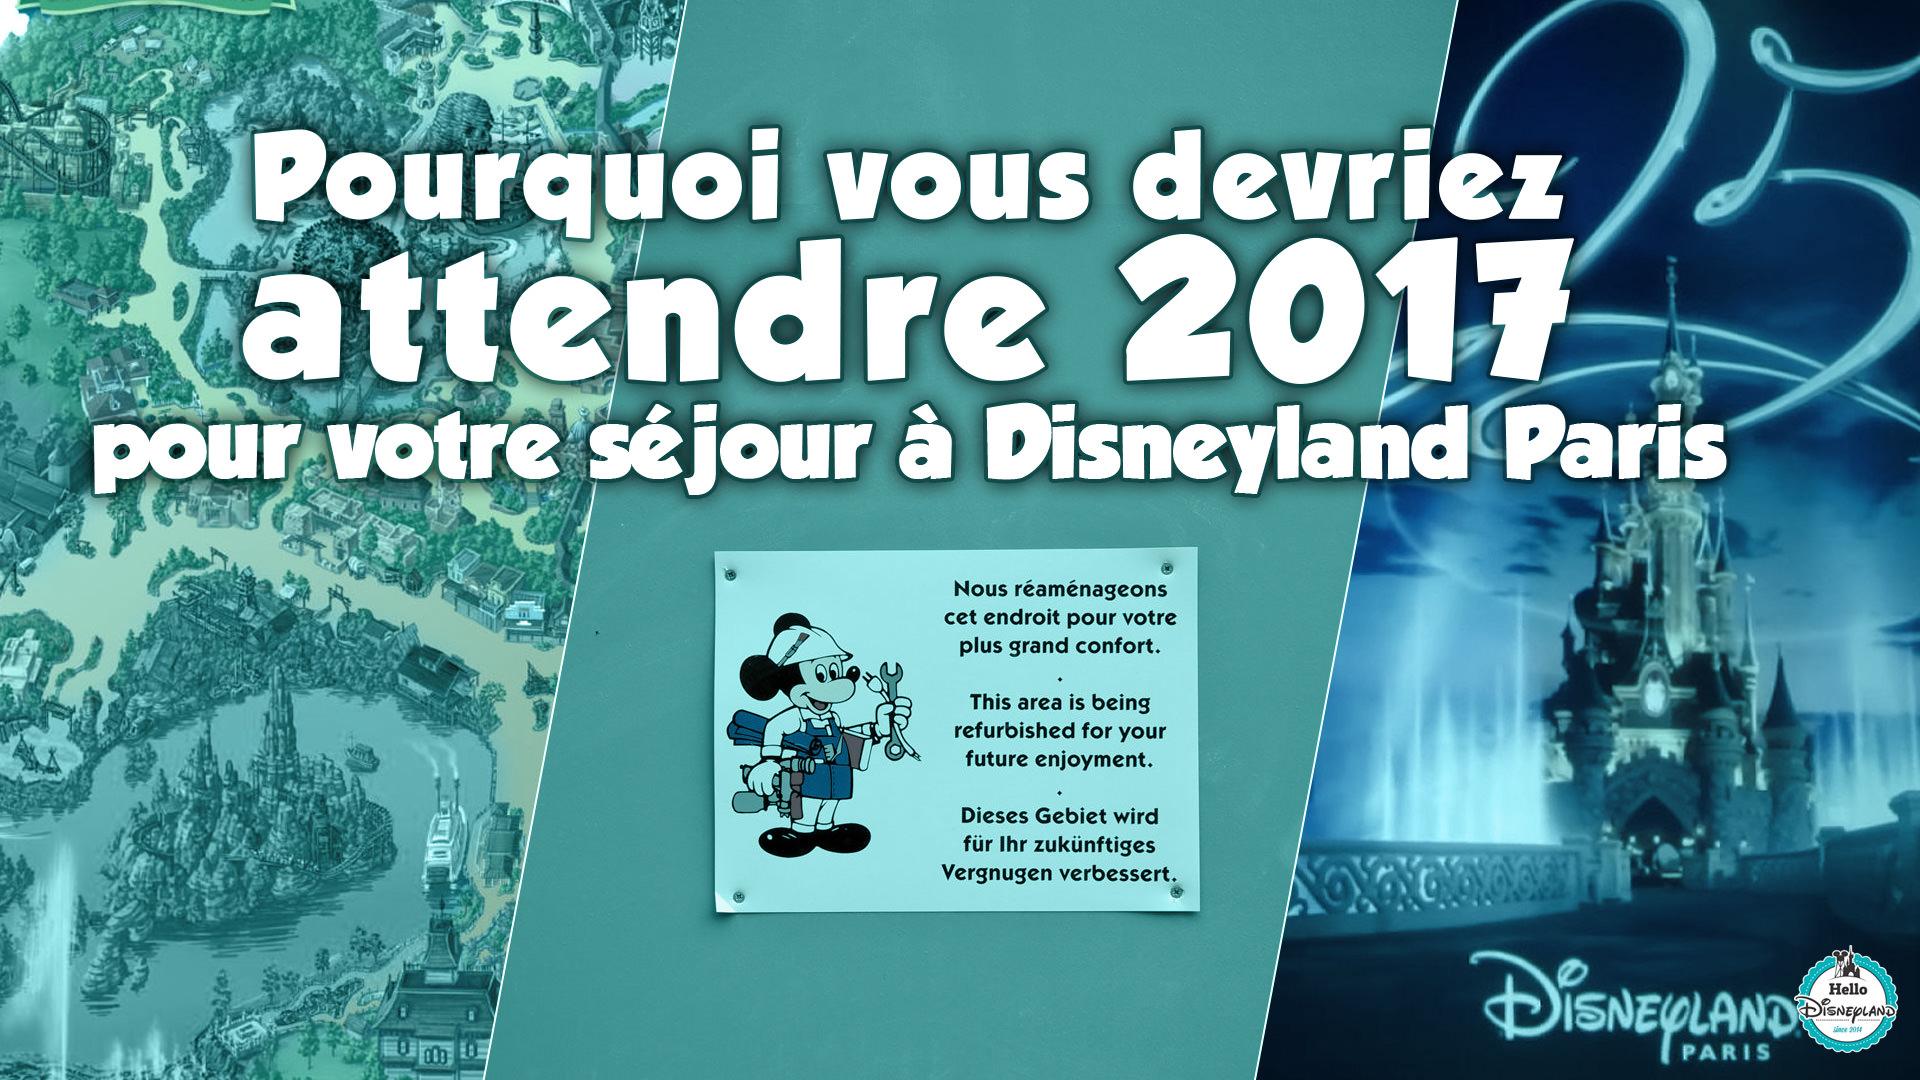 Travaux Disneyland Paris u2013 Aulnay sous Bois 33 blurays info # Ostéopathe Aulnay Sous Bois